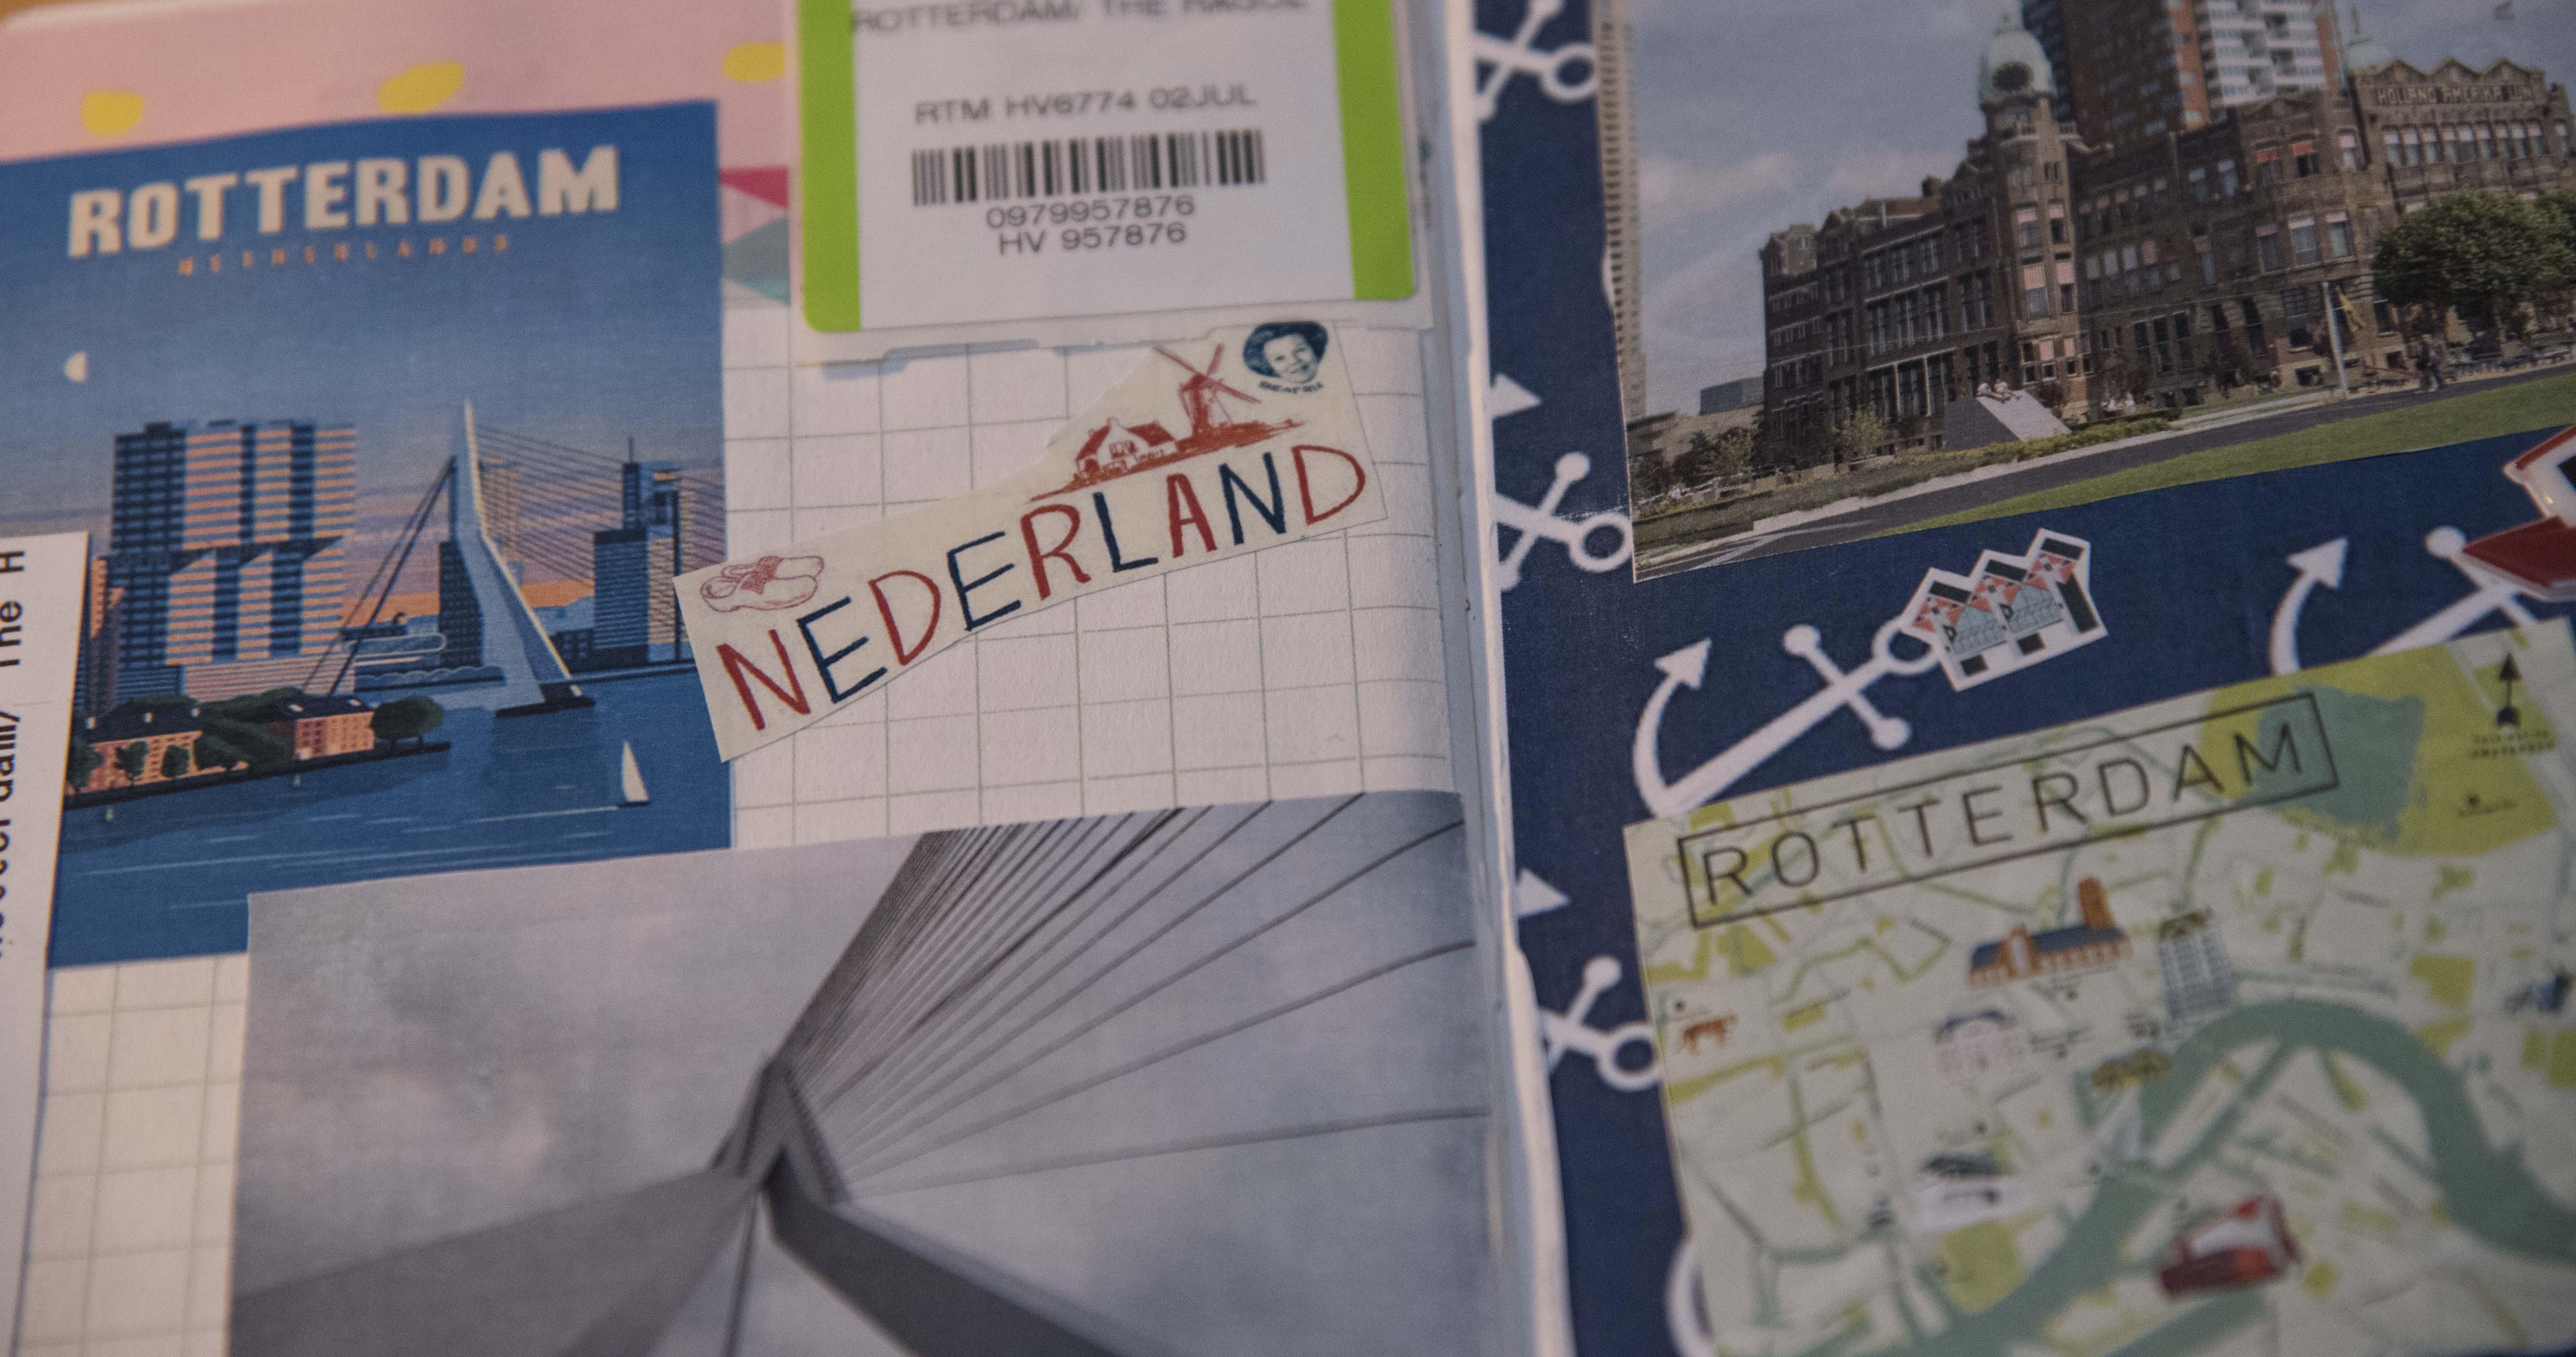 rotterdam_erasmus_bridge.jpg